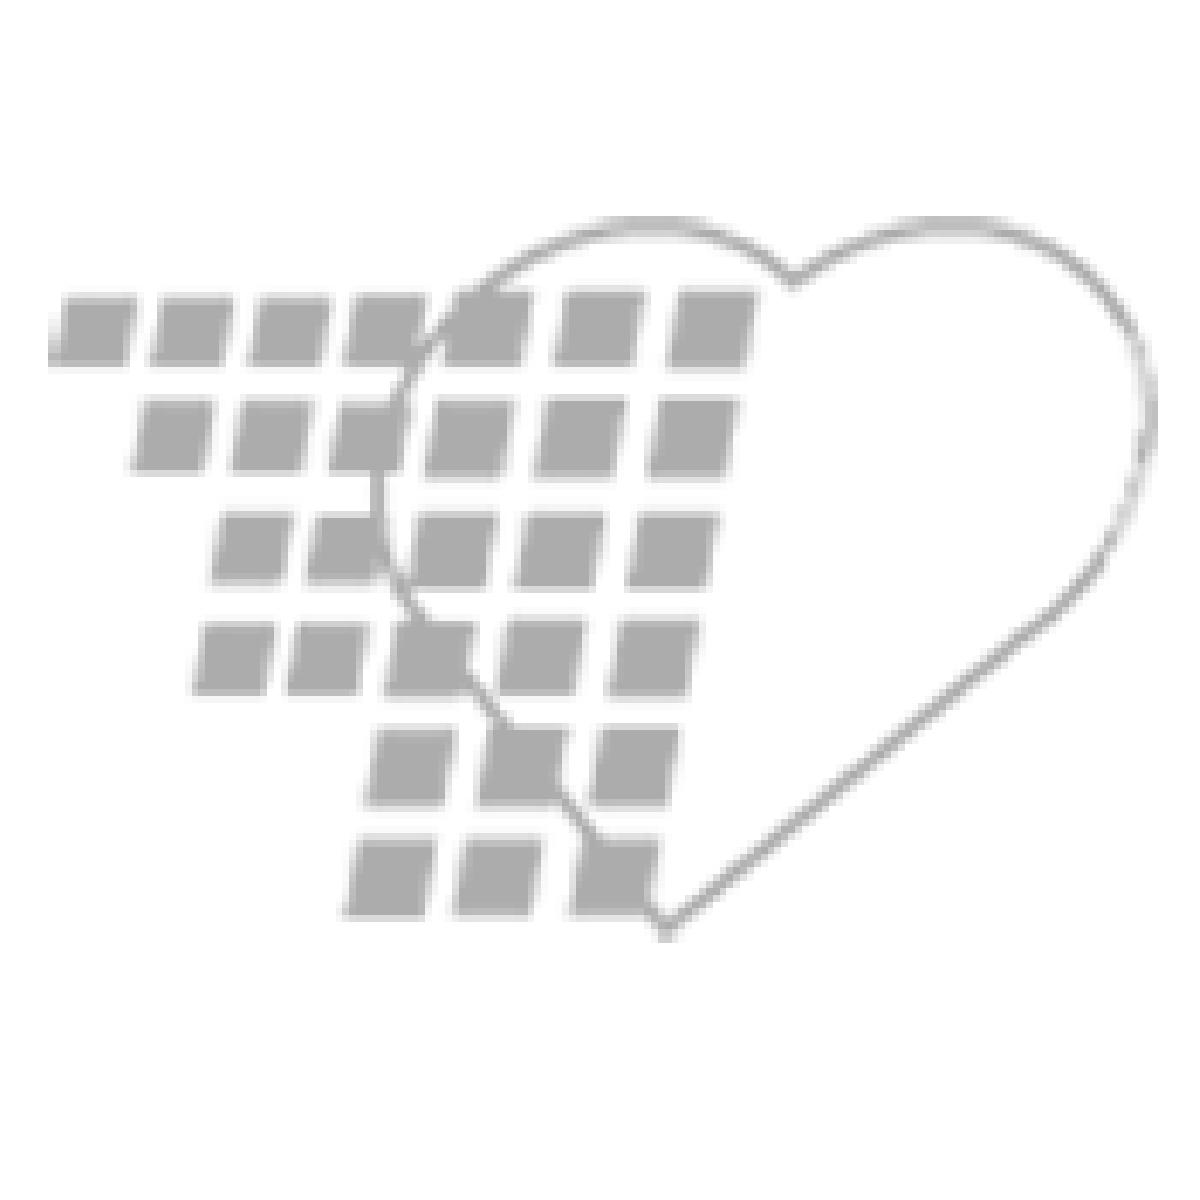 06-93-1112 - Demo Dose® Simulated Code Drug Set #2